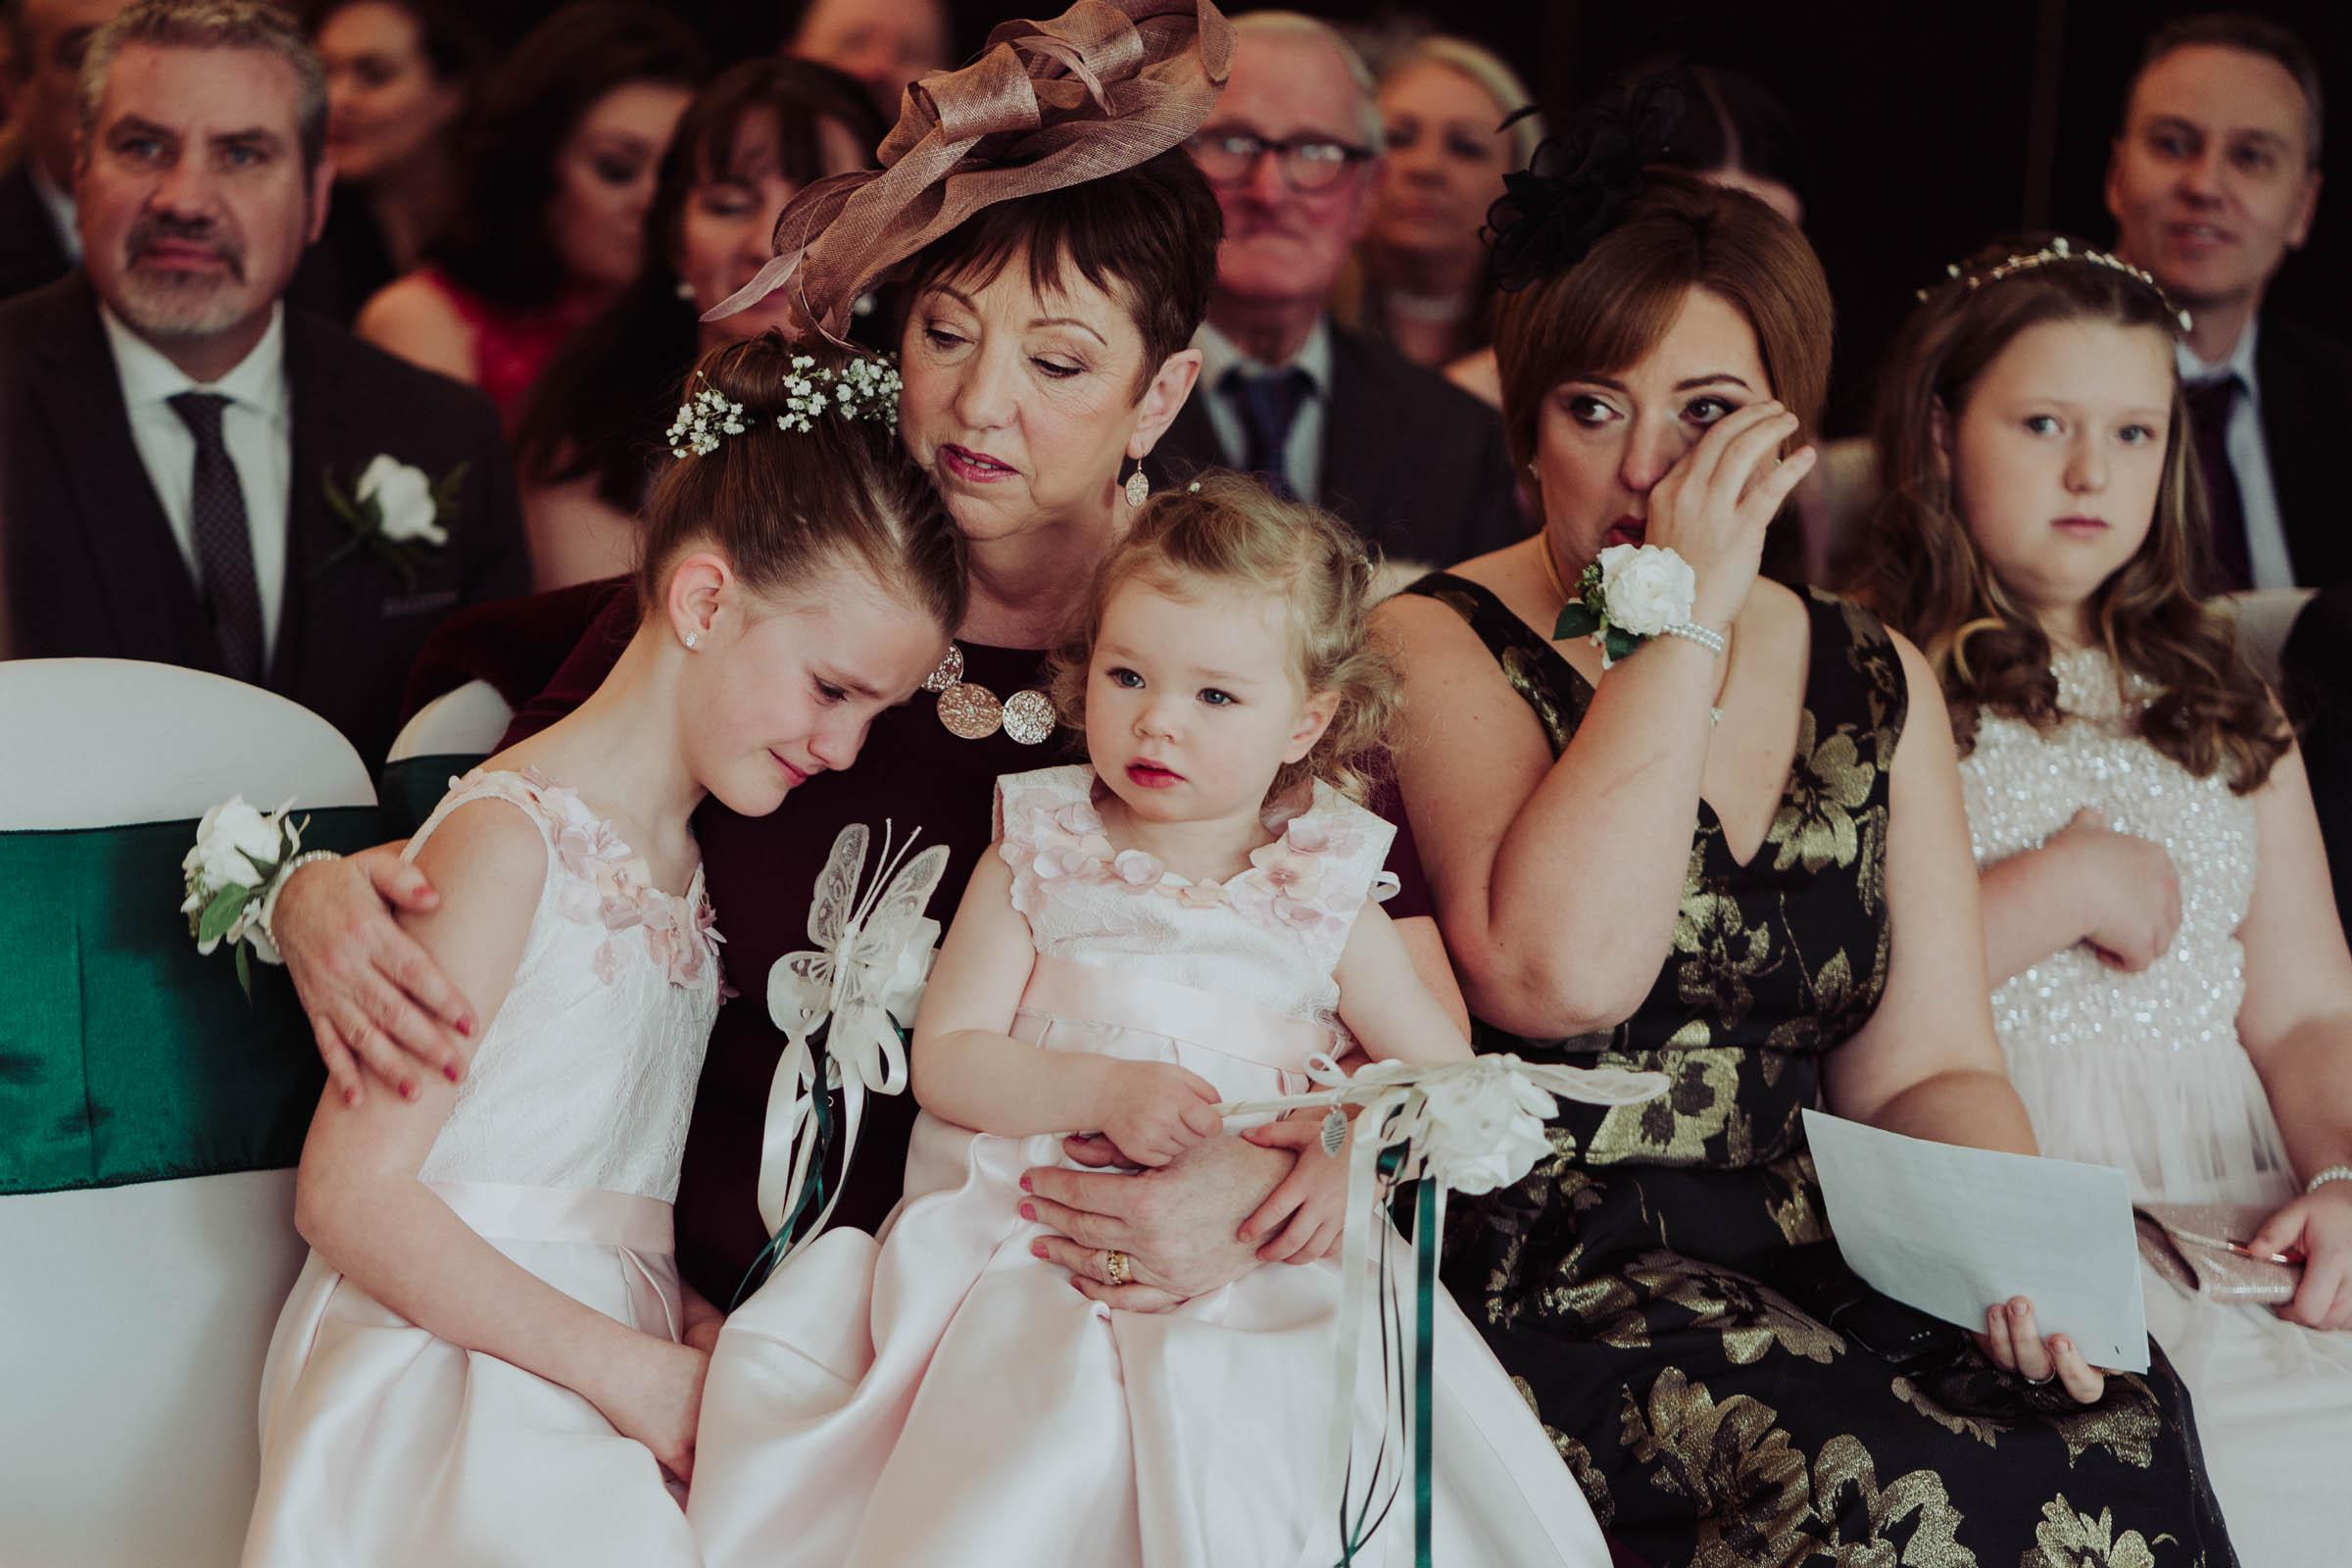 Radstone-Wedding-Dearly-Photography-Scotland (13 of 50).jpg